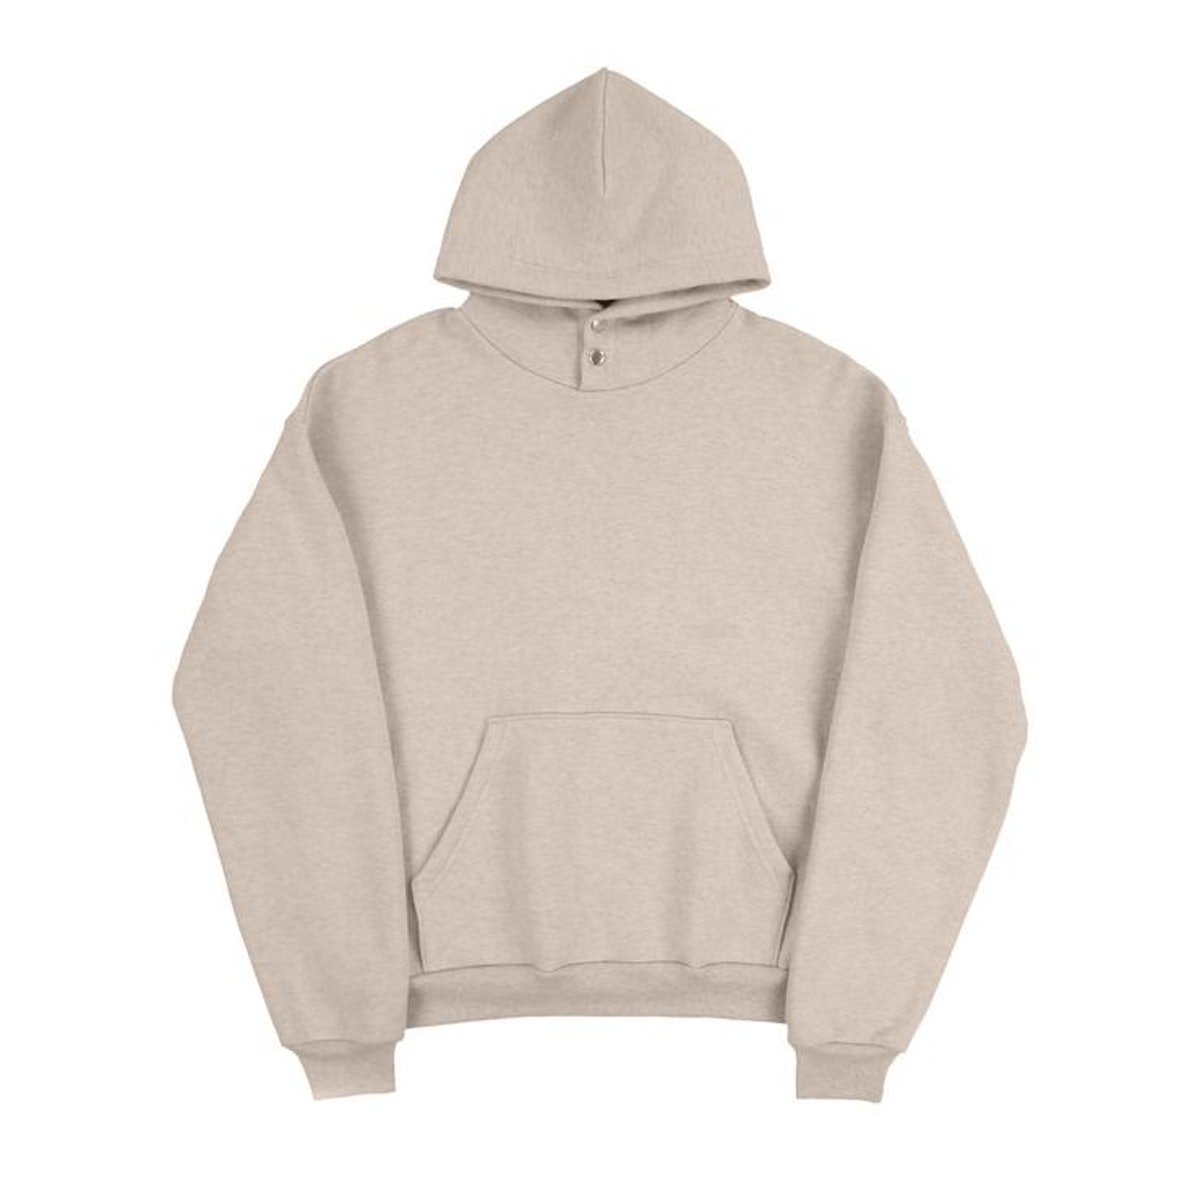 Snap Hooded Sweatshirt